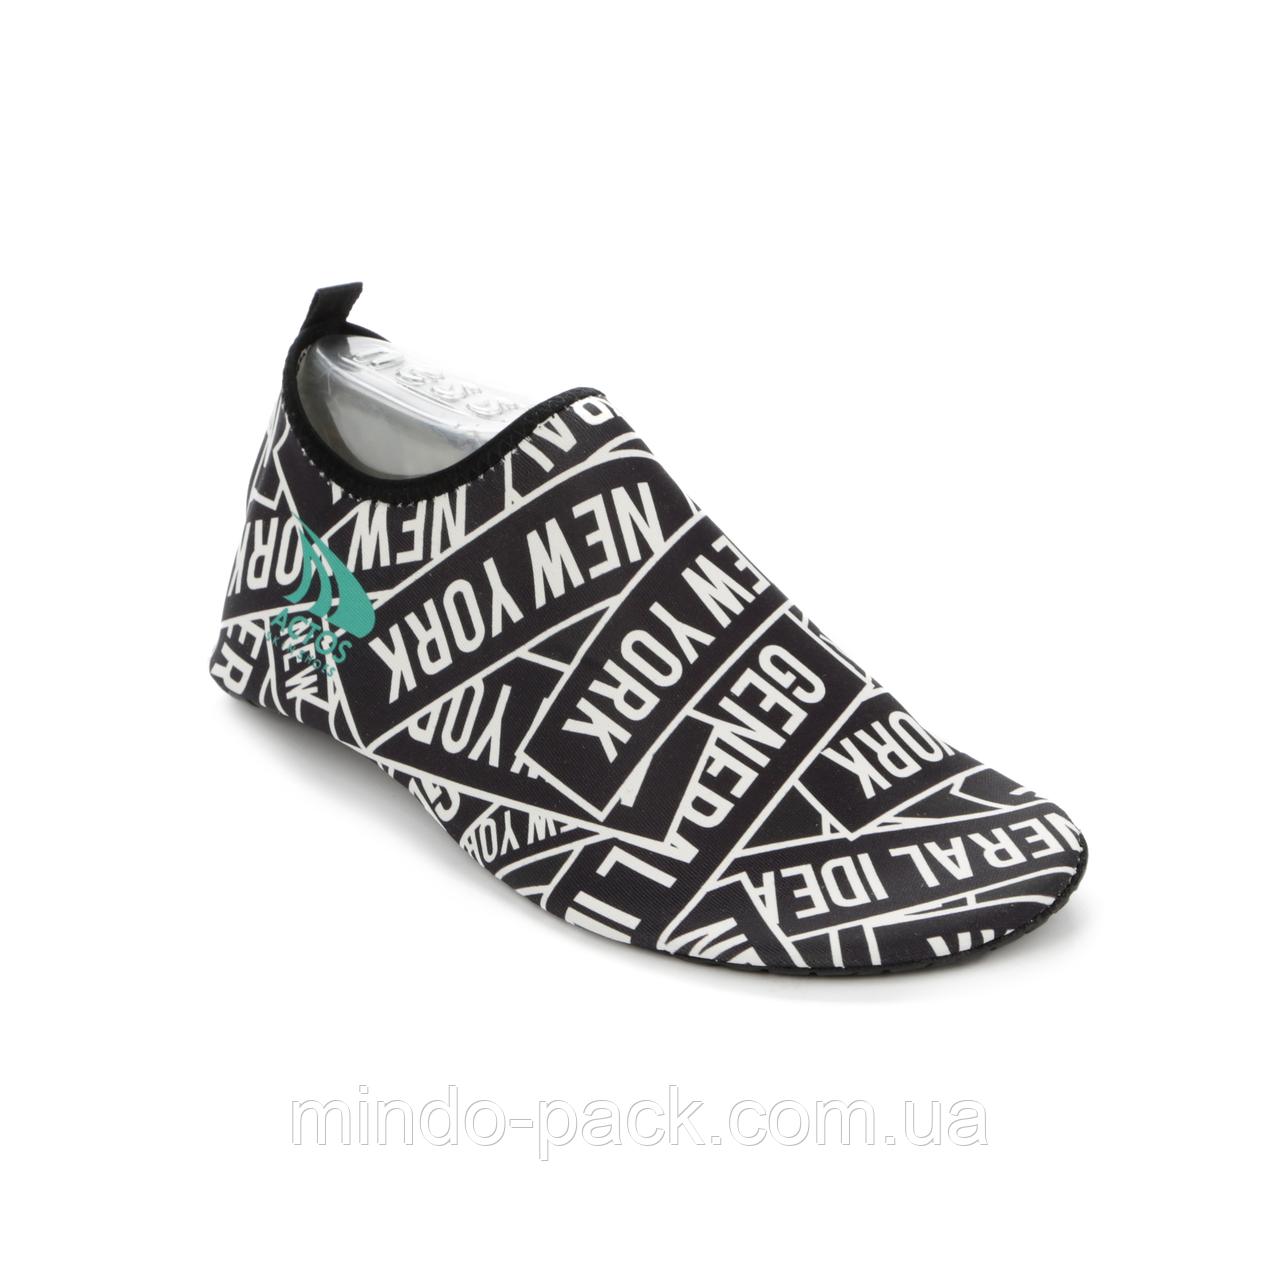 Actos Skin Shoes (разм. 37-37.5) (New York Black)